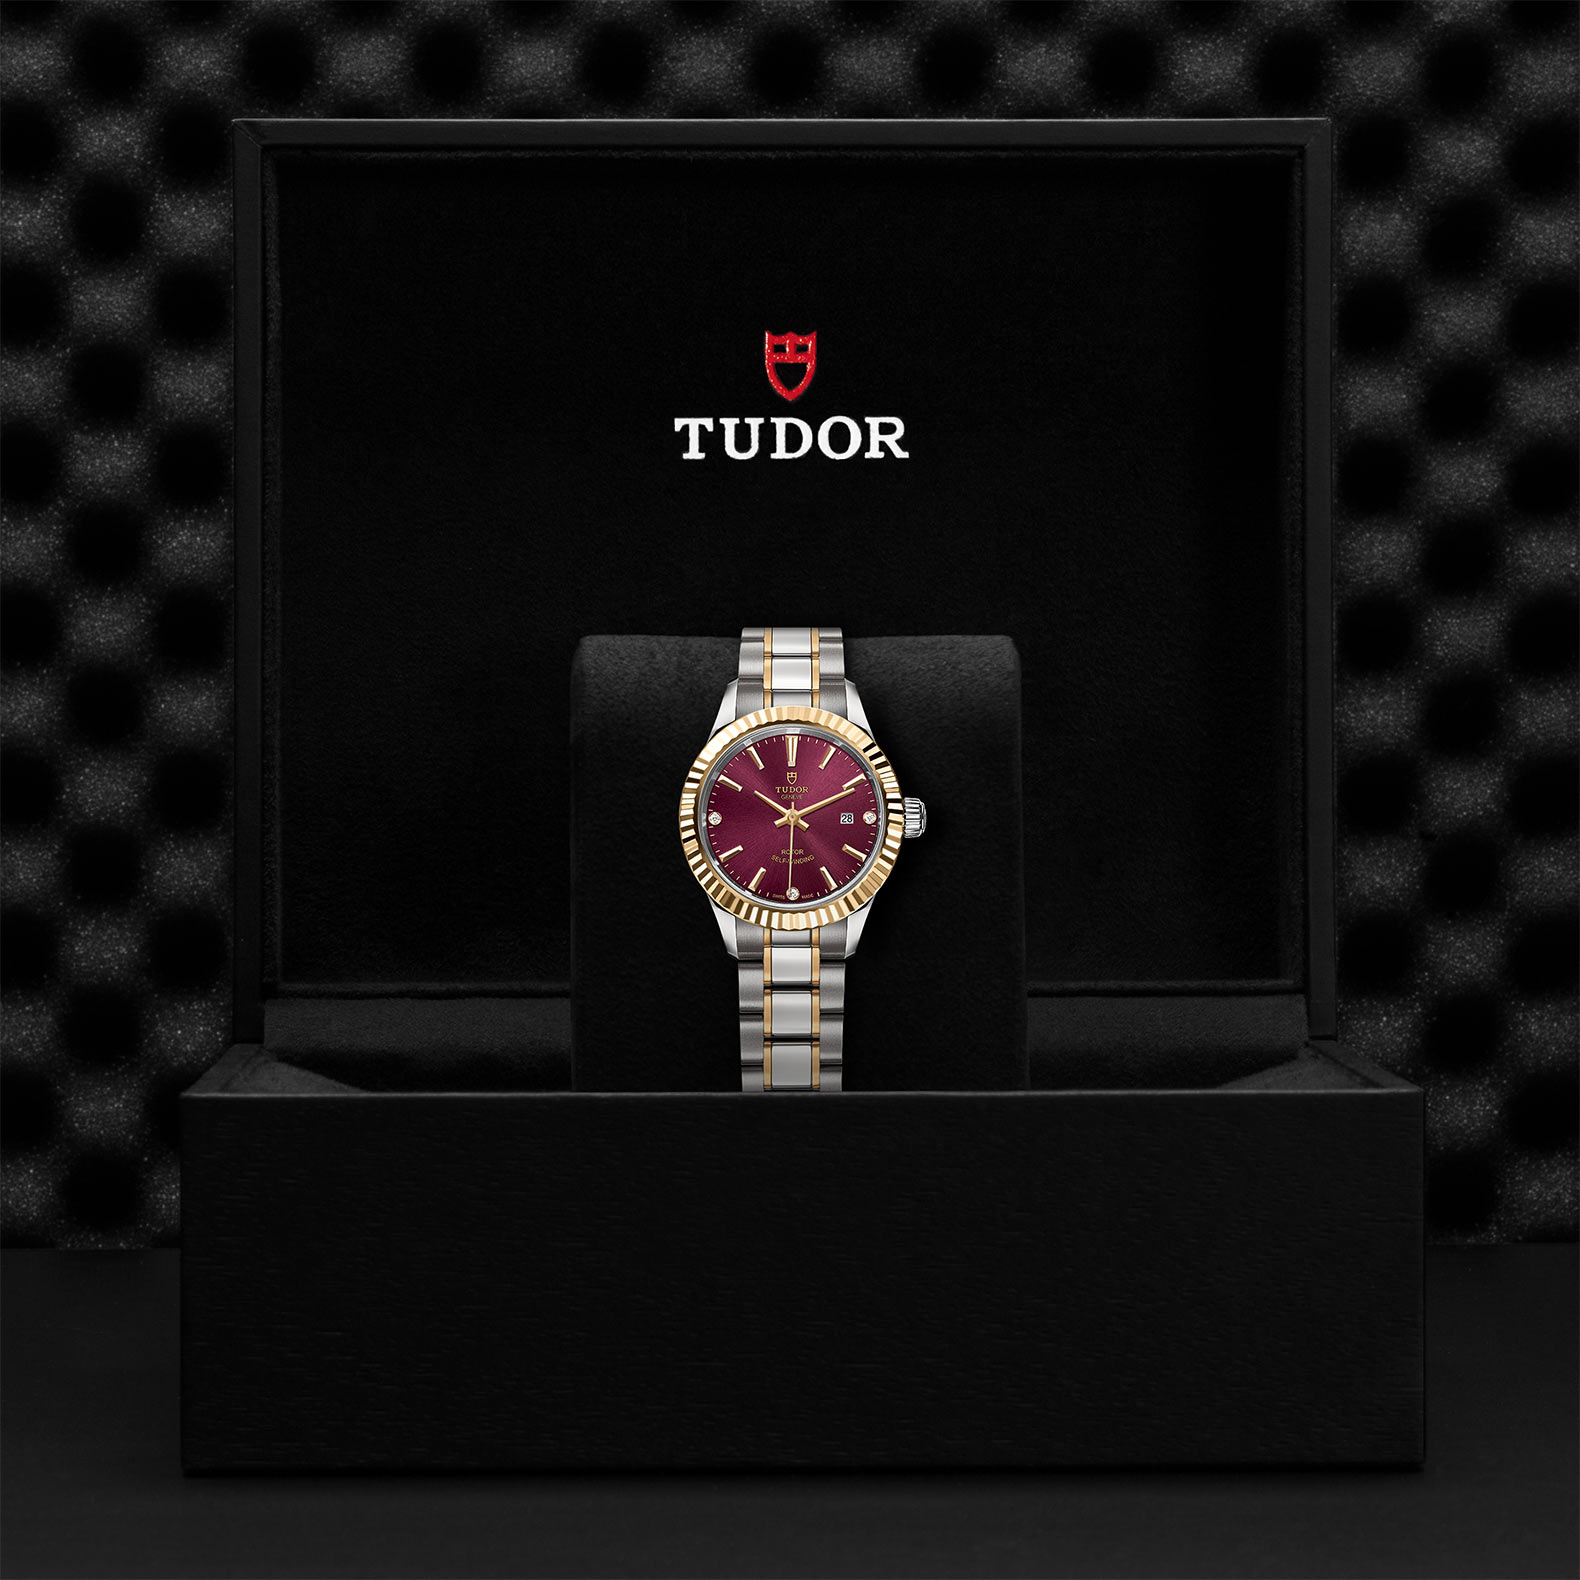 TUDOR Style M12113 0015 Presentation